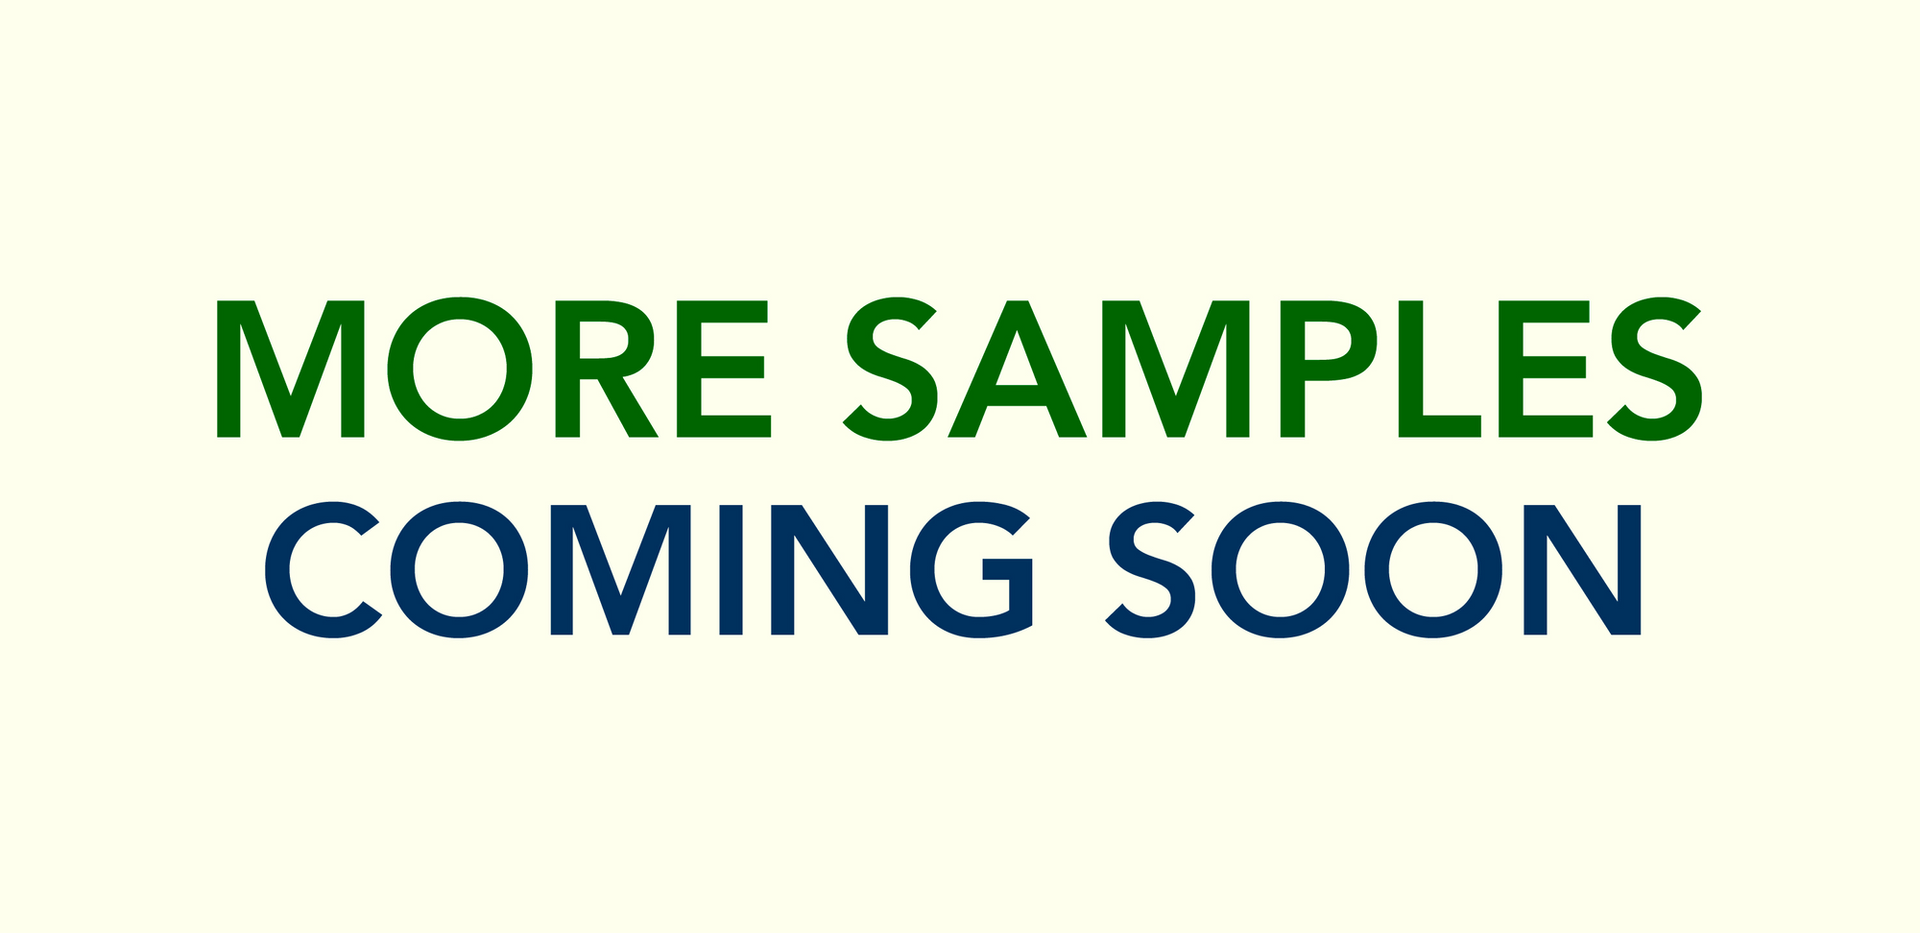 MoreSamplesComingSoon-RedBue.png